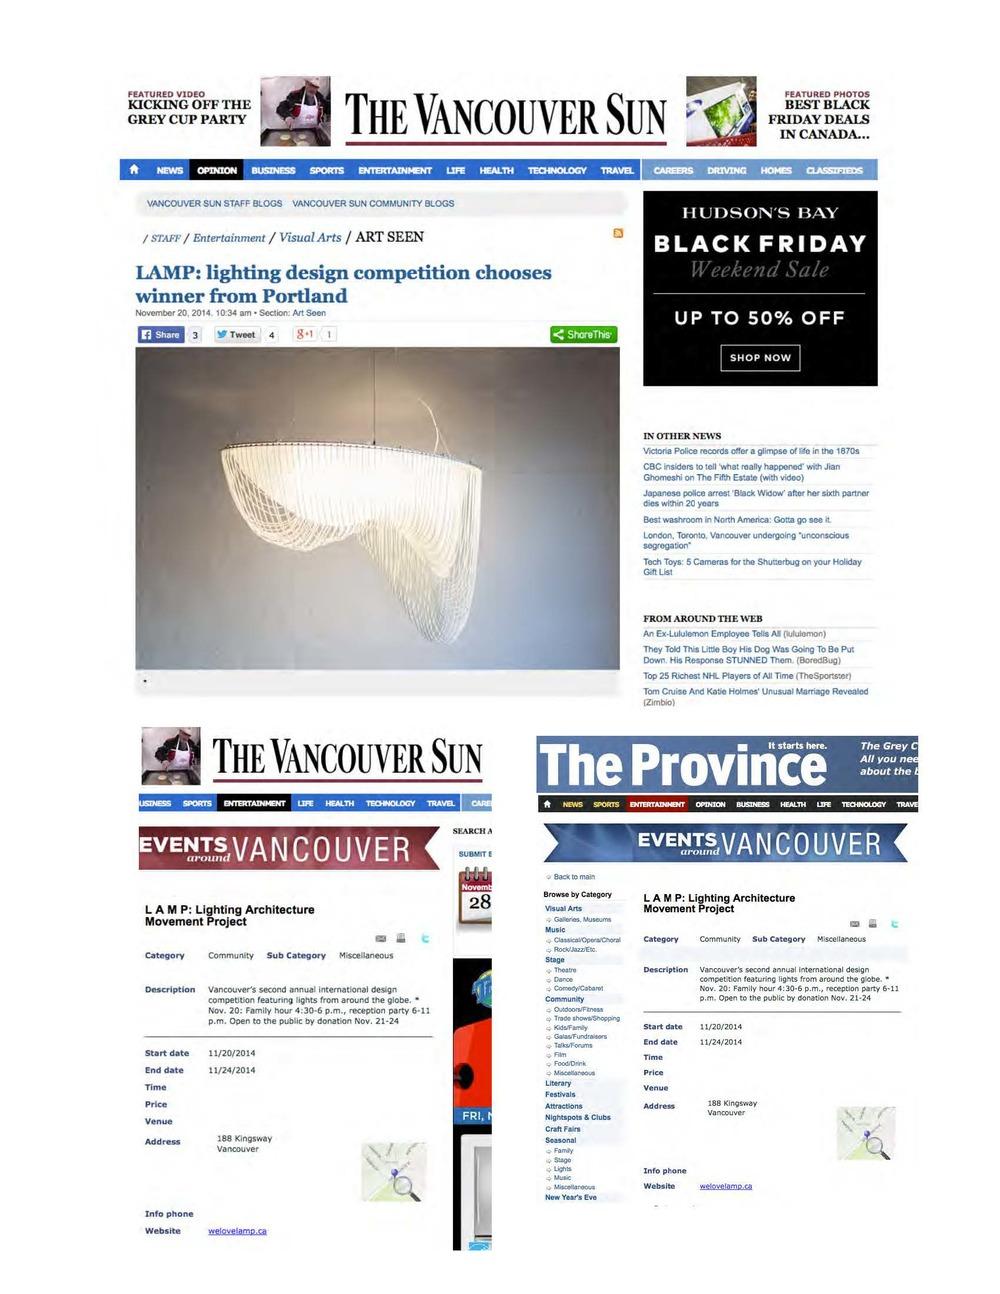 LAMP 2014 Press Kit_Page_22.jpg